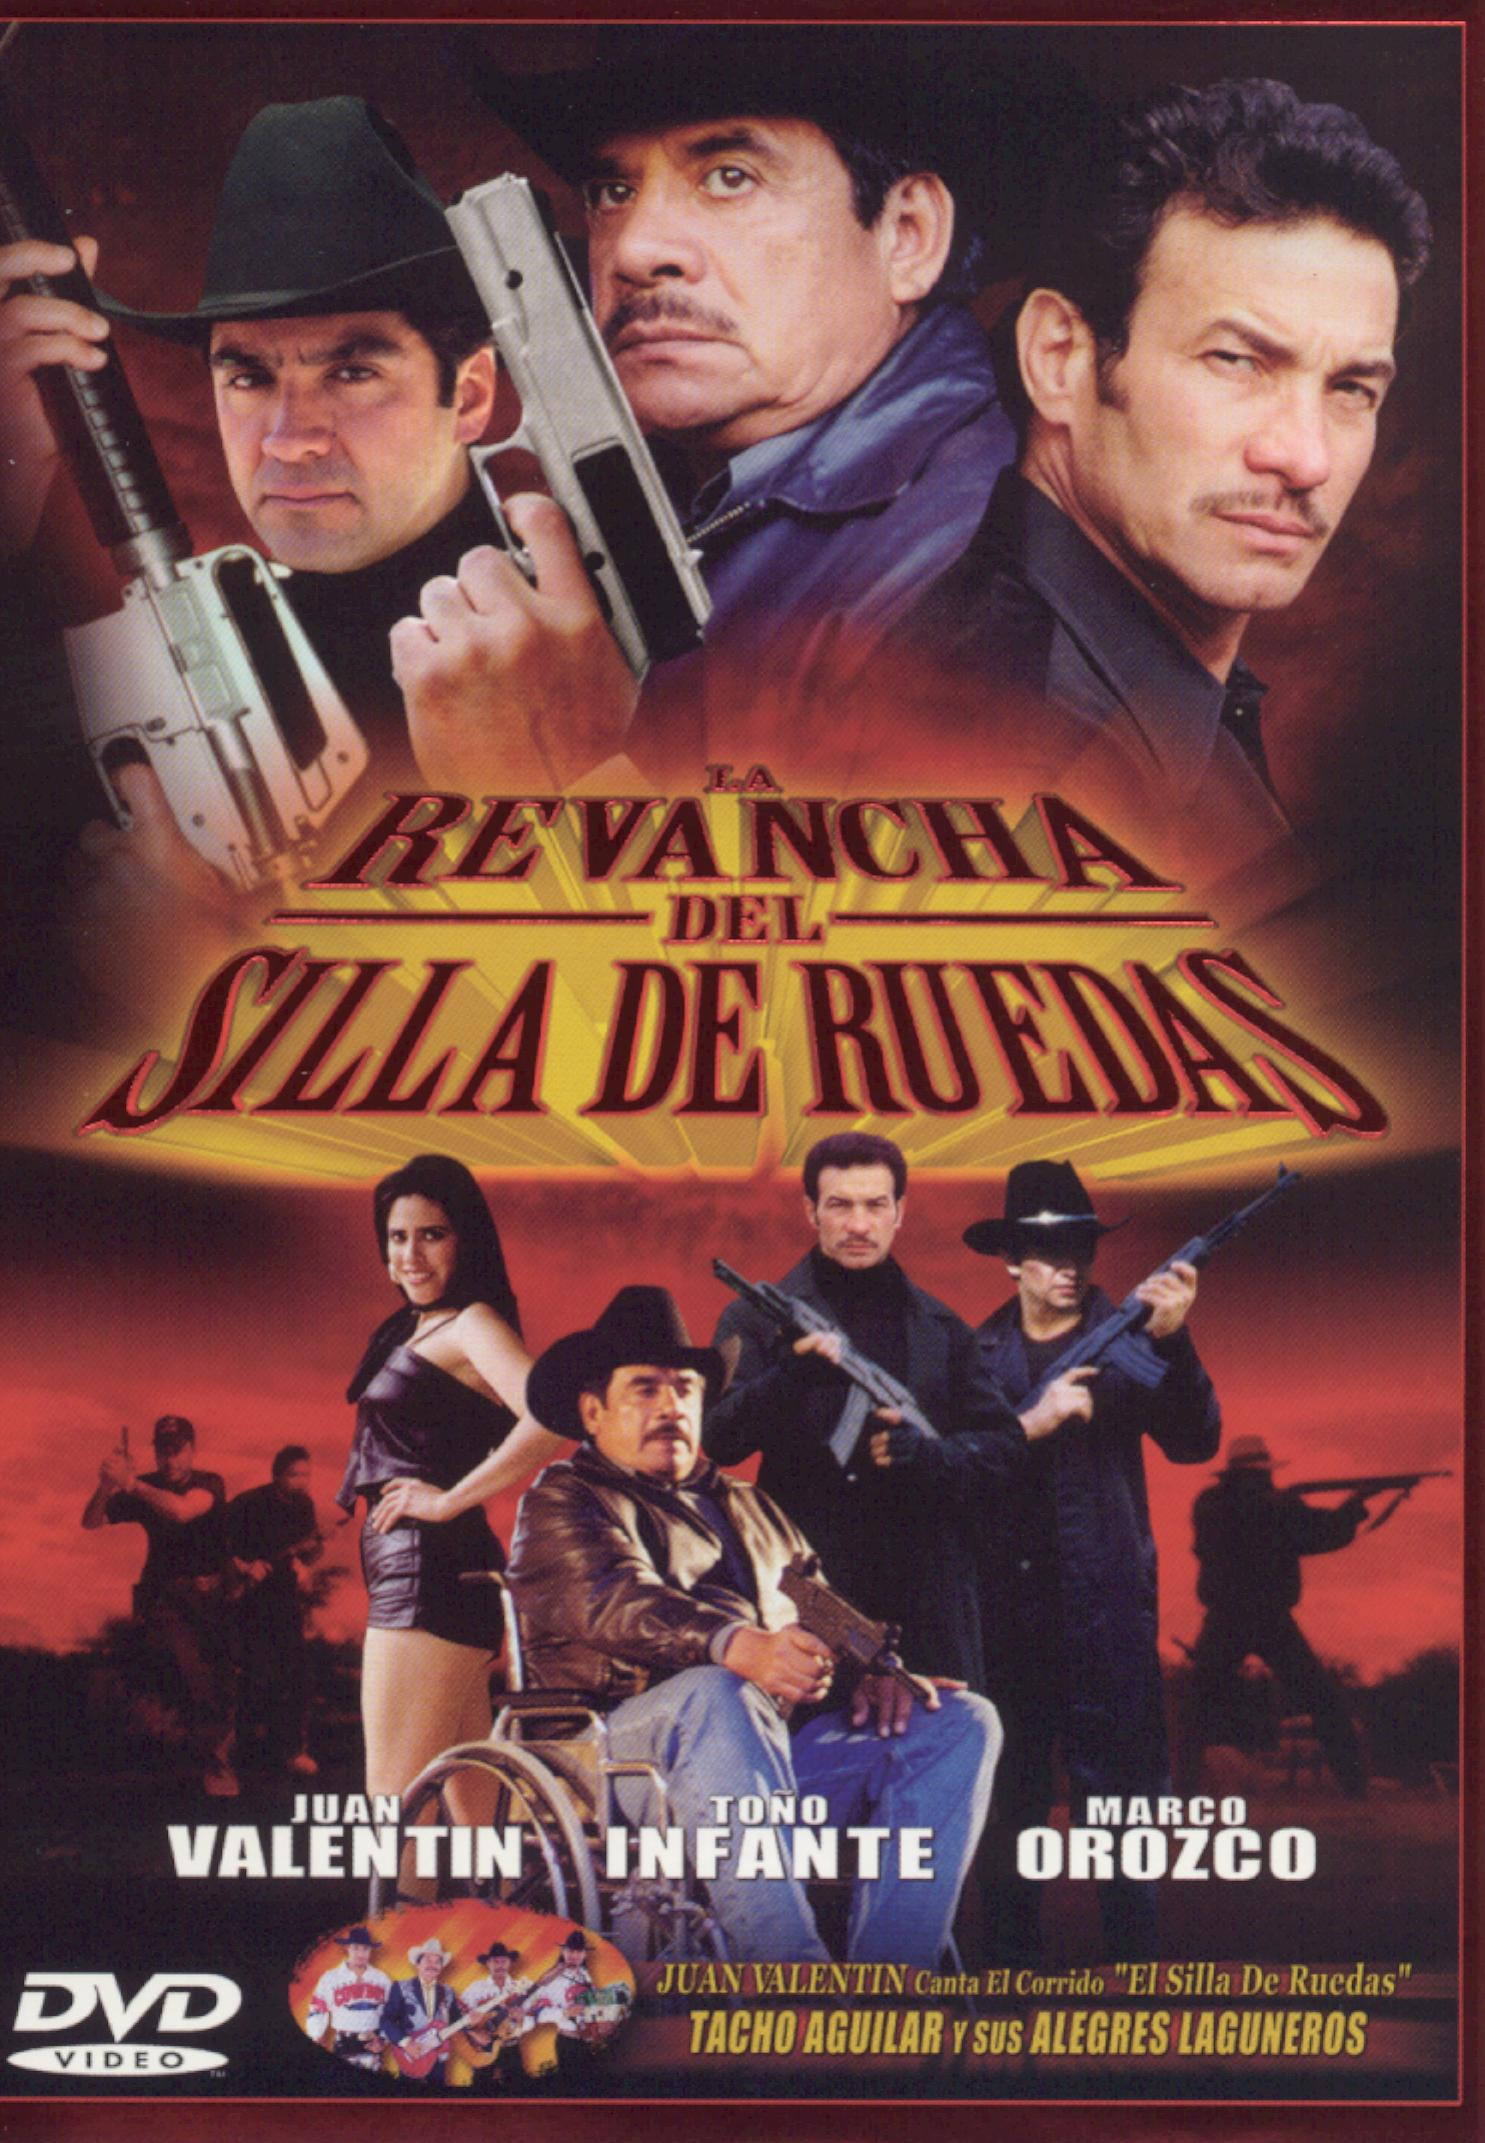 La Revancha Del Silla De Ruedas